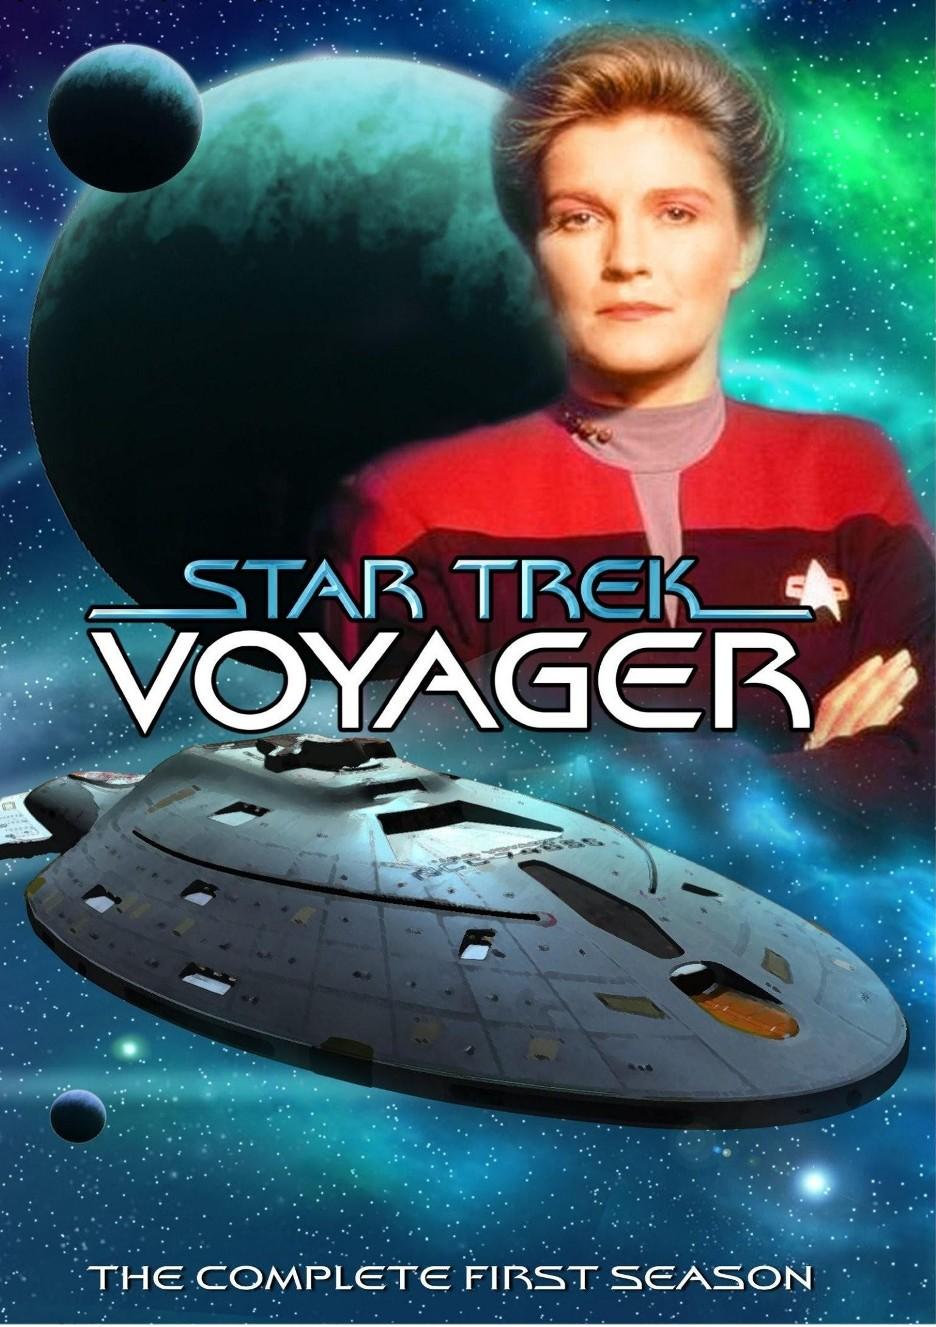 Star Trek Voyager Espanol 65